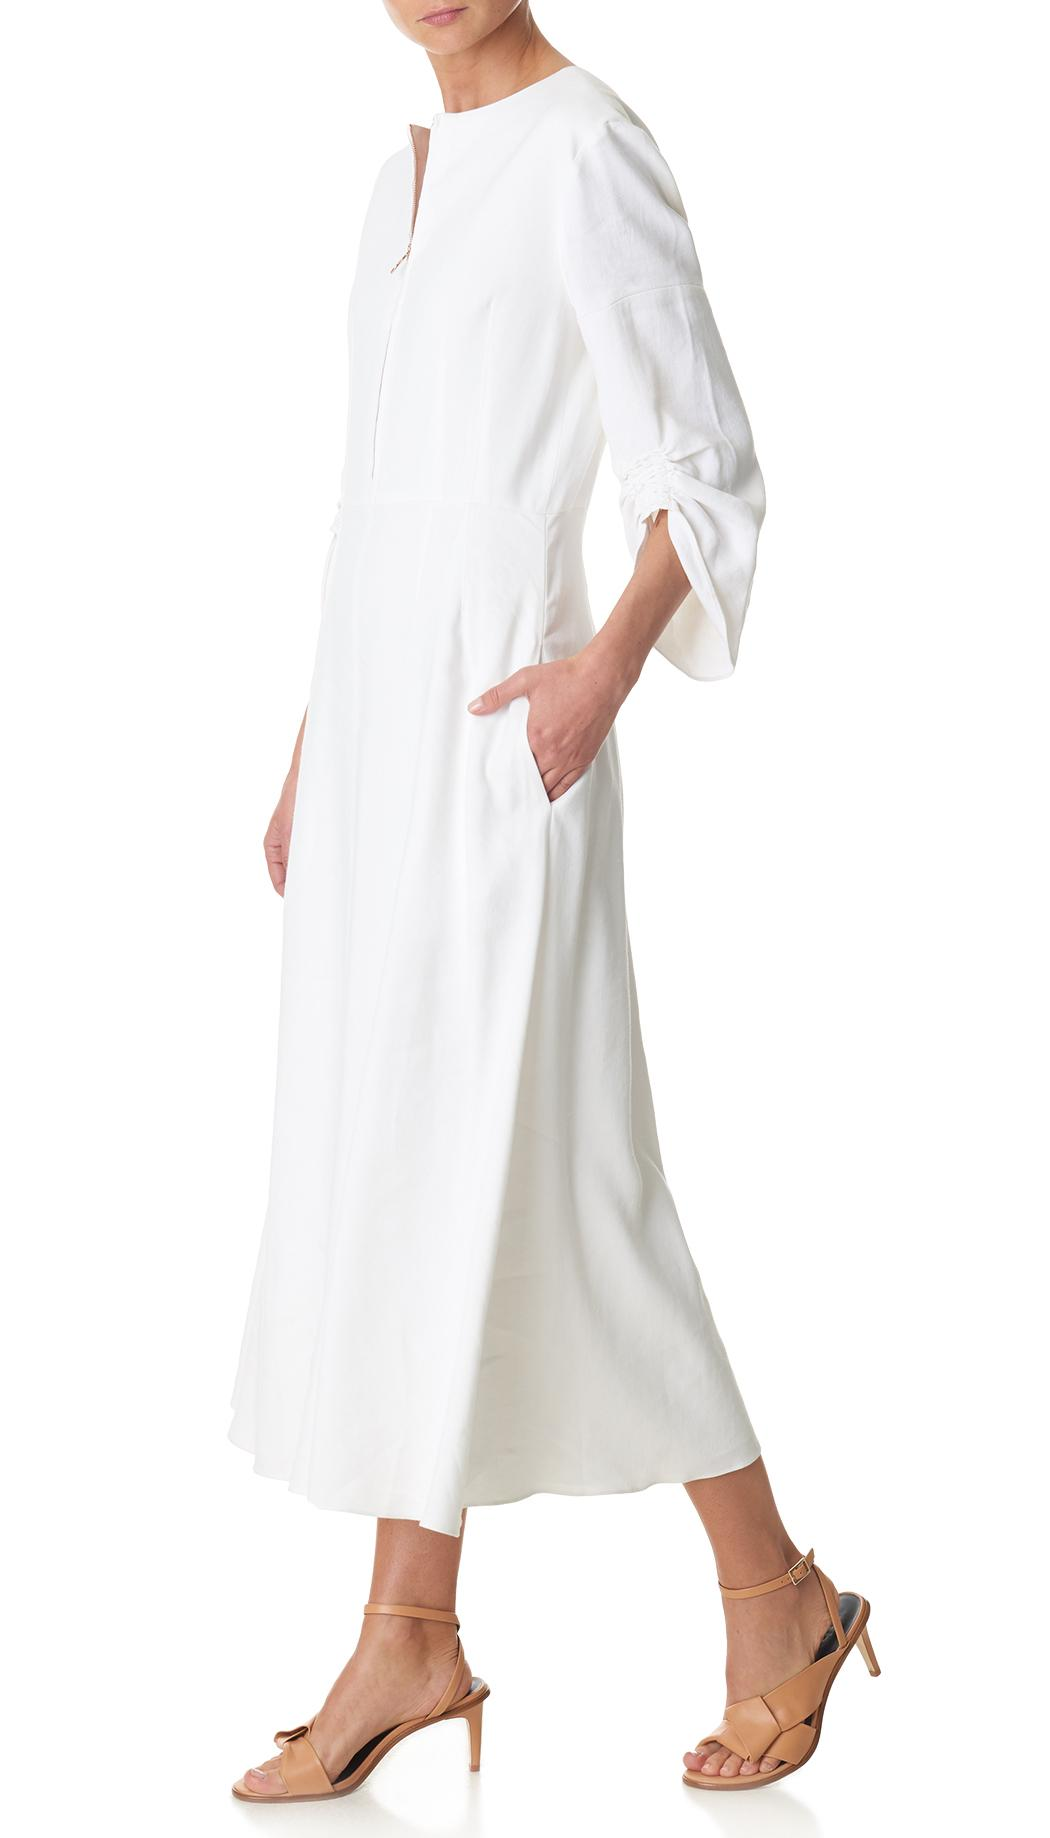 9009b1de0f Gallery. Women s White Linen Dresses ...